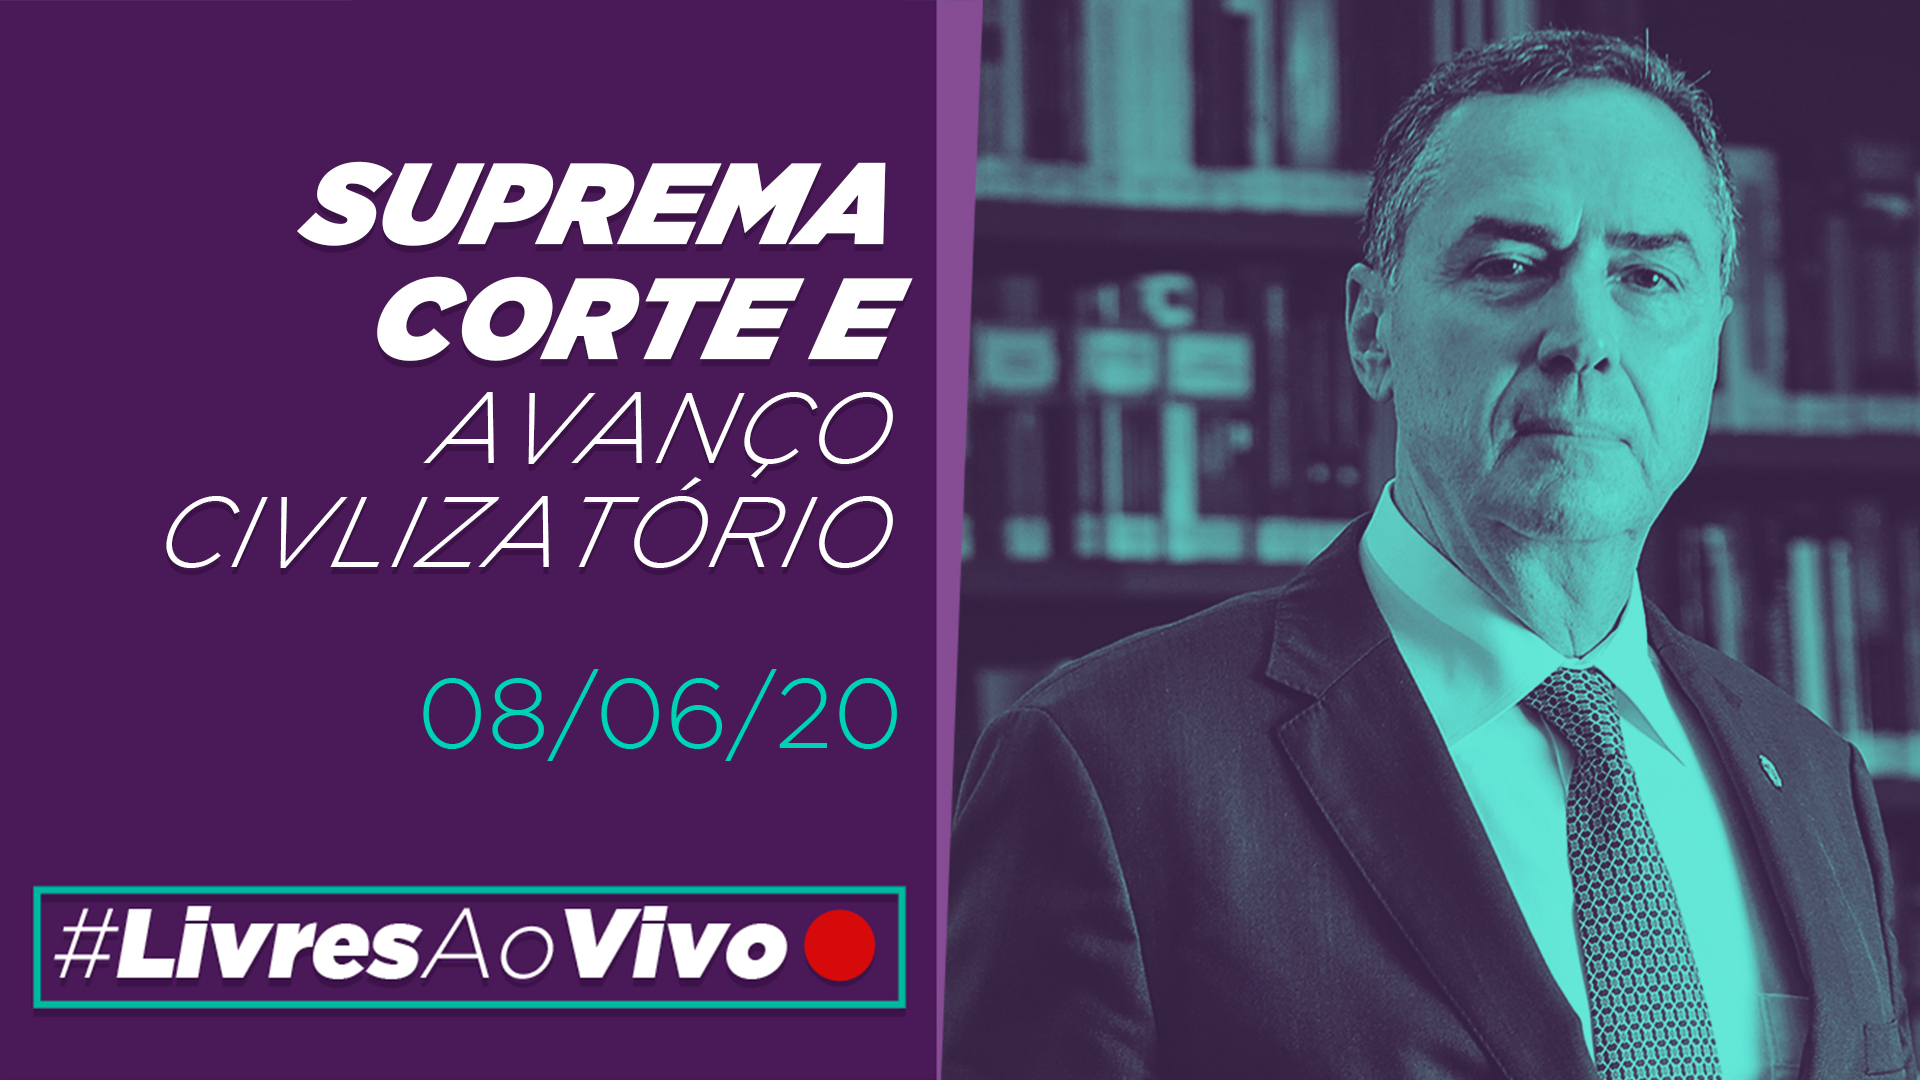 Luís Roberto Barroso:  Suprema corte e avanço civilizatório